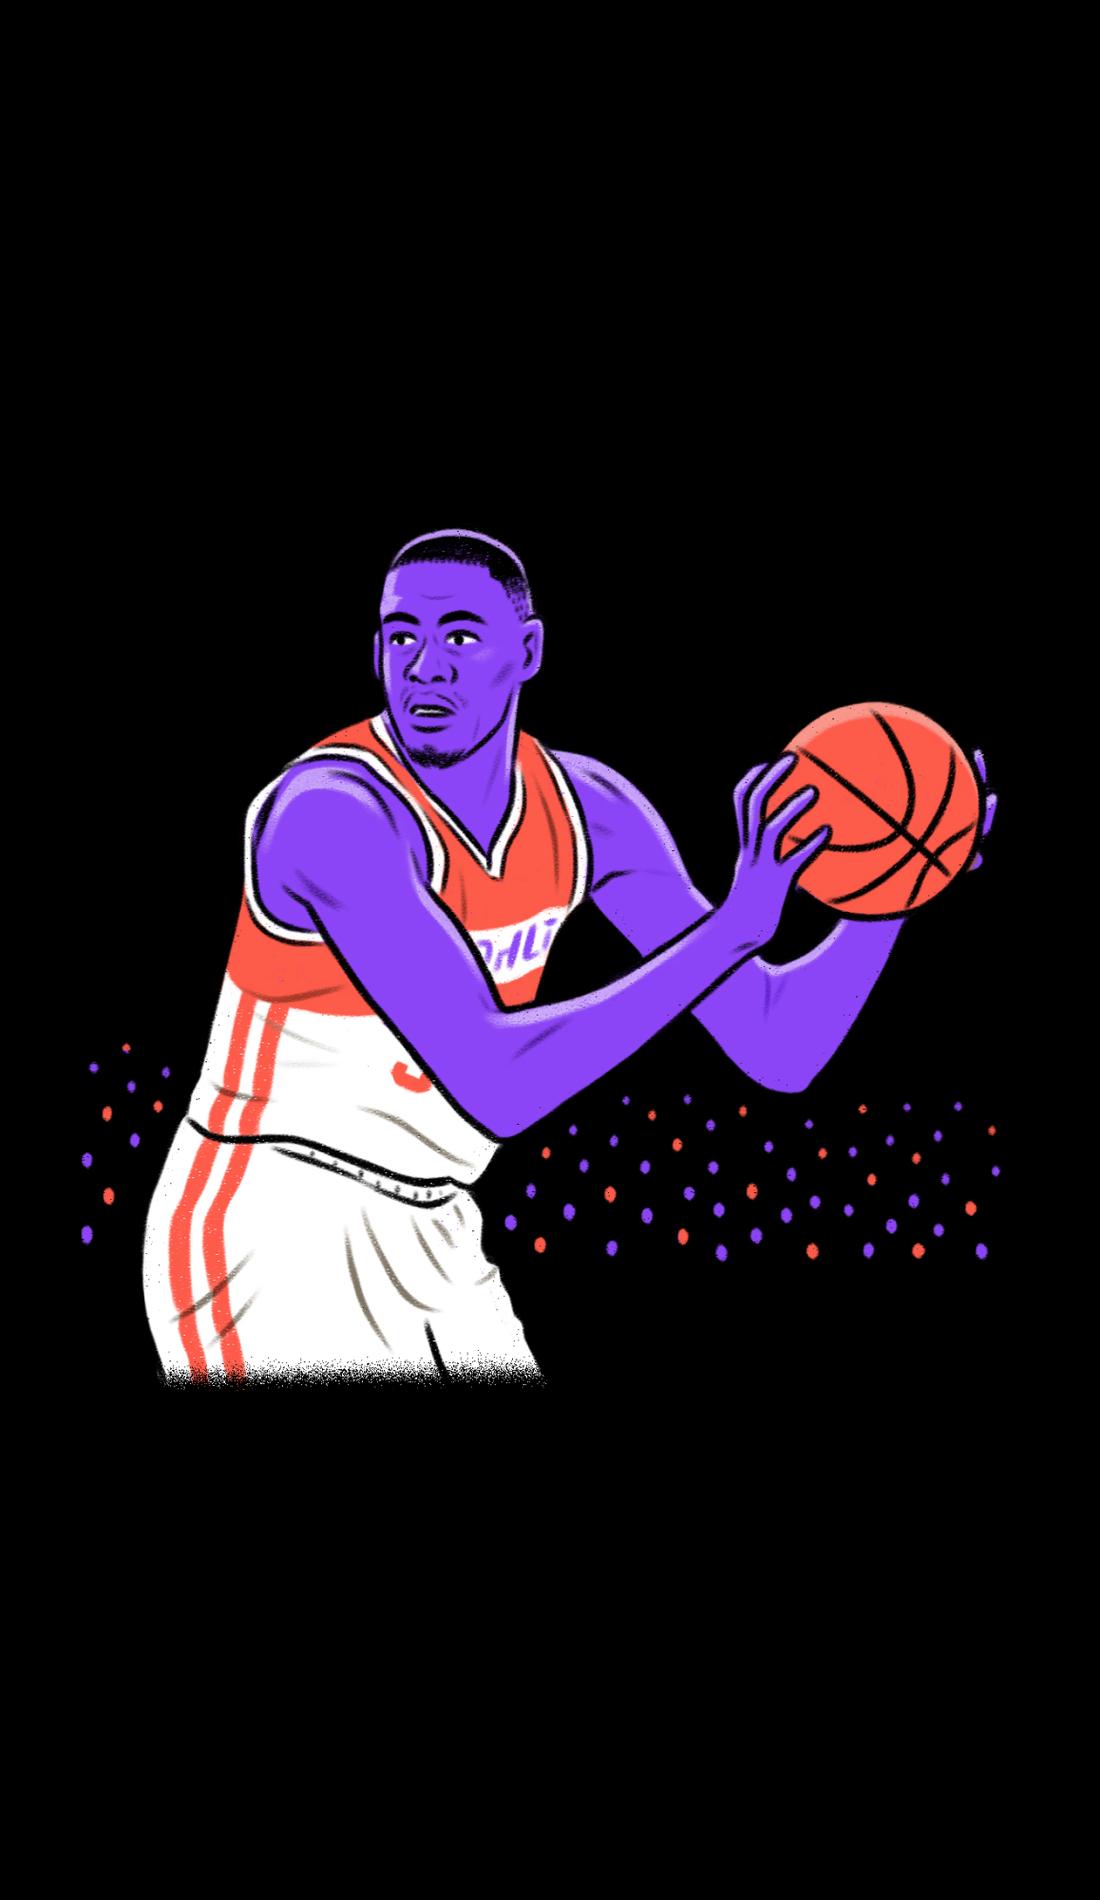 A LSU Tigers Basketball live event